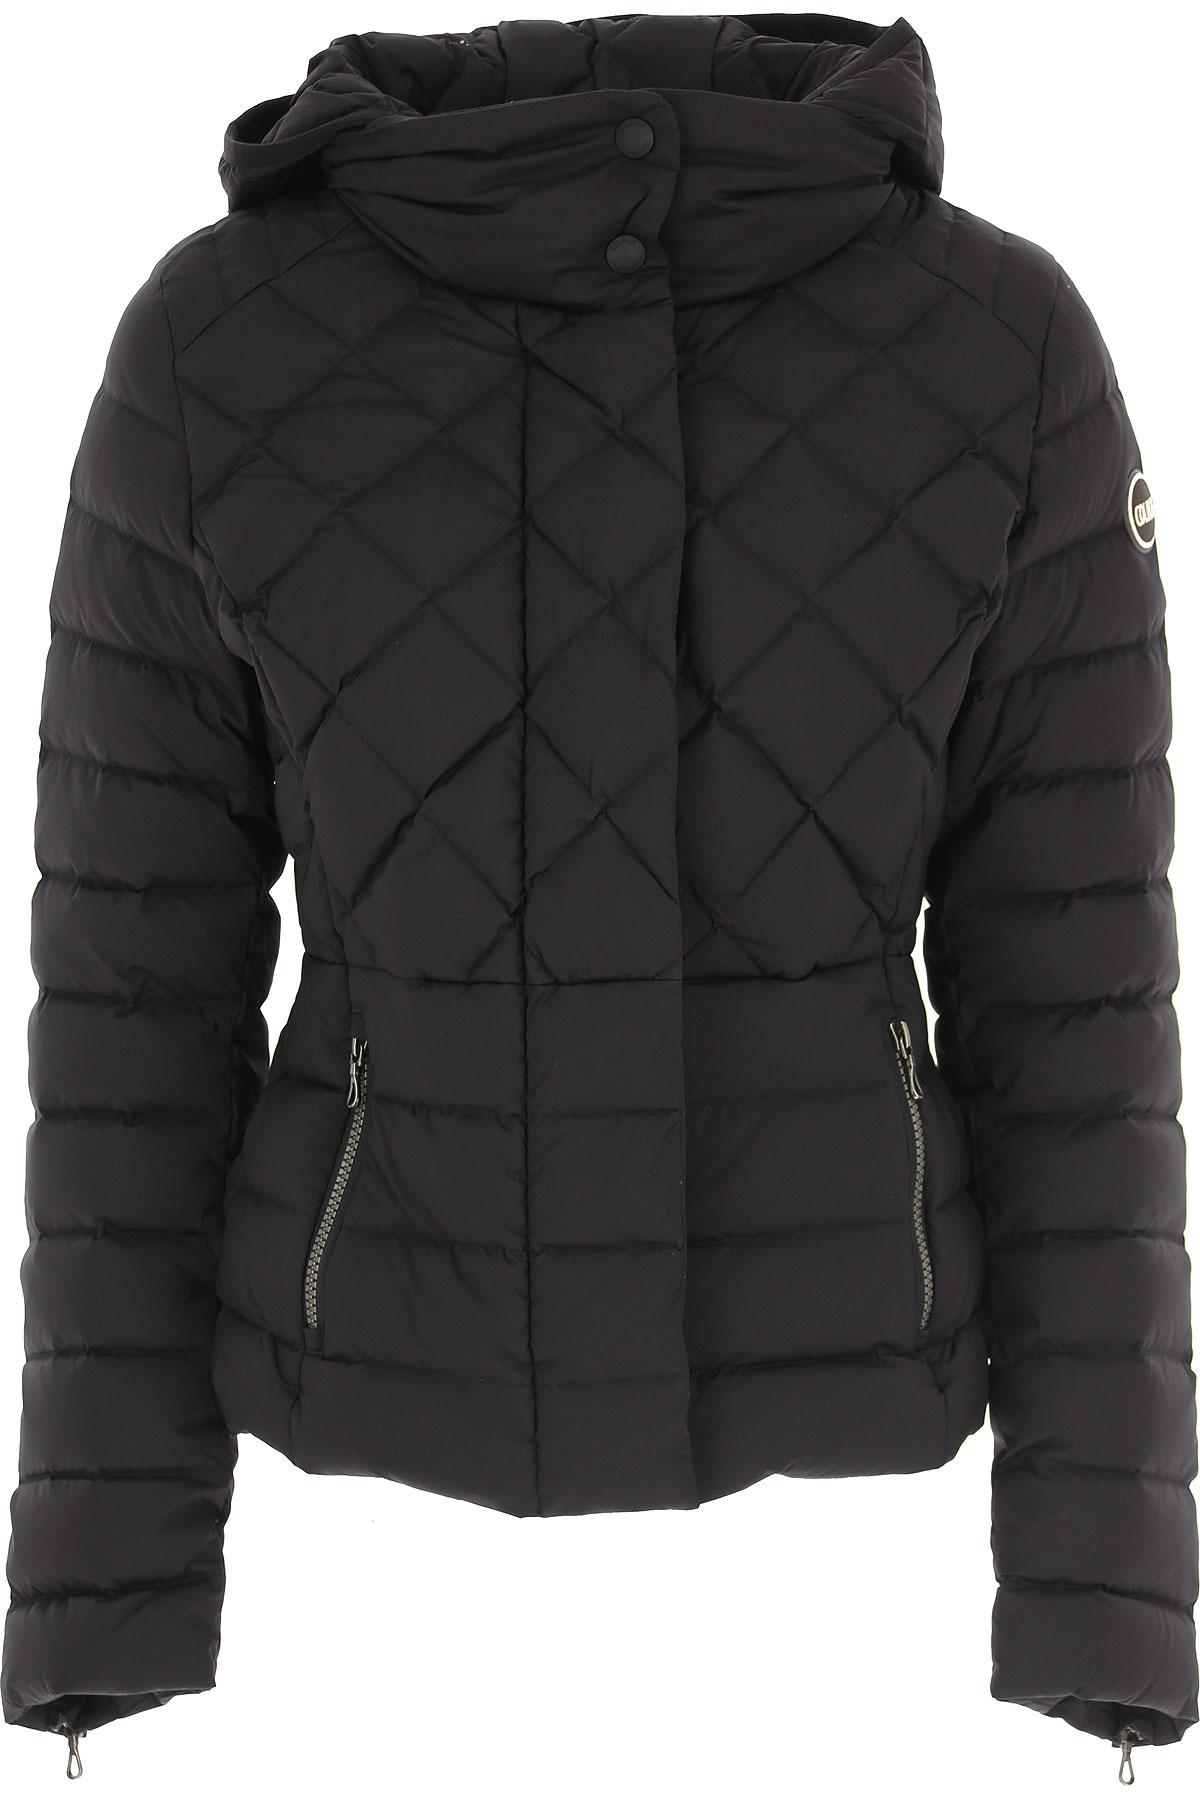 Colmar Down Jacket for Women, Puffer Ski Jacket On Sale in Outlet, Black, polyamide, 2019, 4 6 8